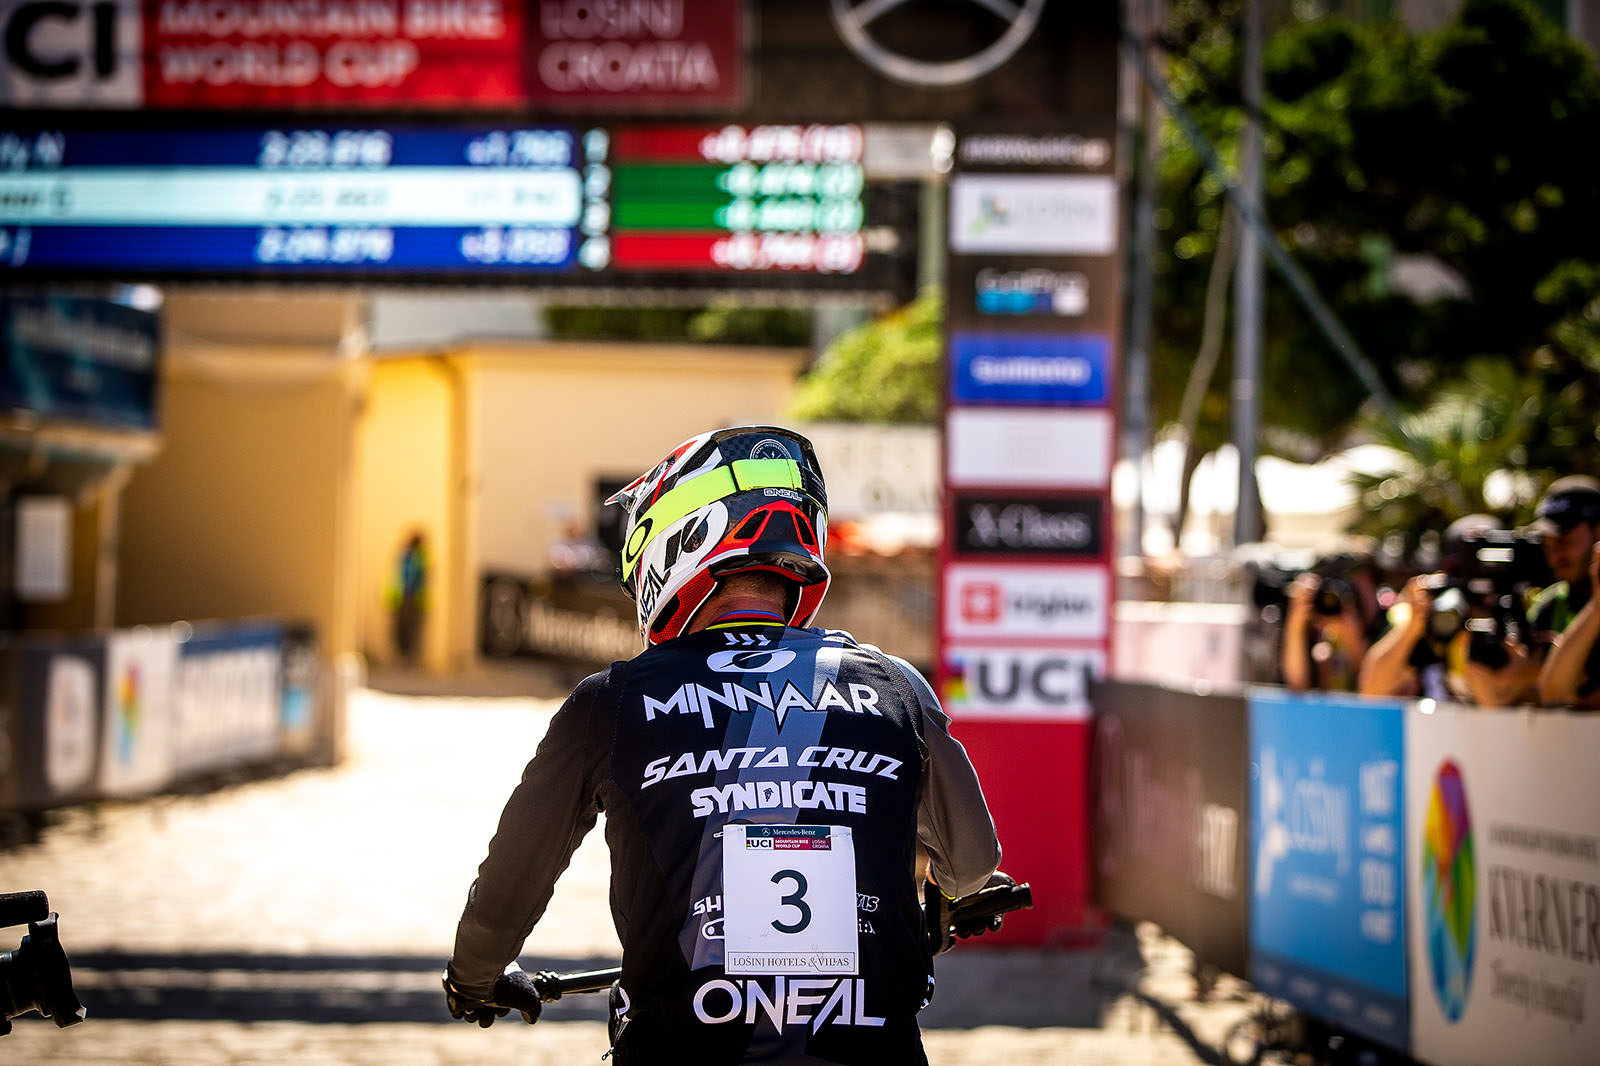 Santa Cruz Bicycles - The Syndicate's Greg Minnaar at Losinj World Cup DH Finish